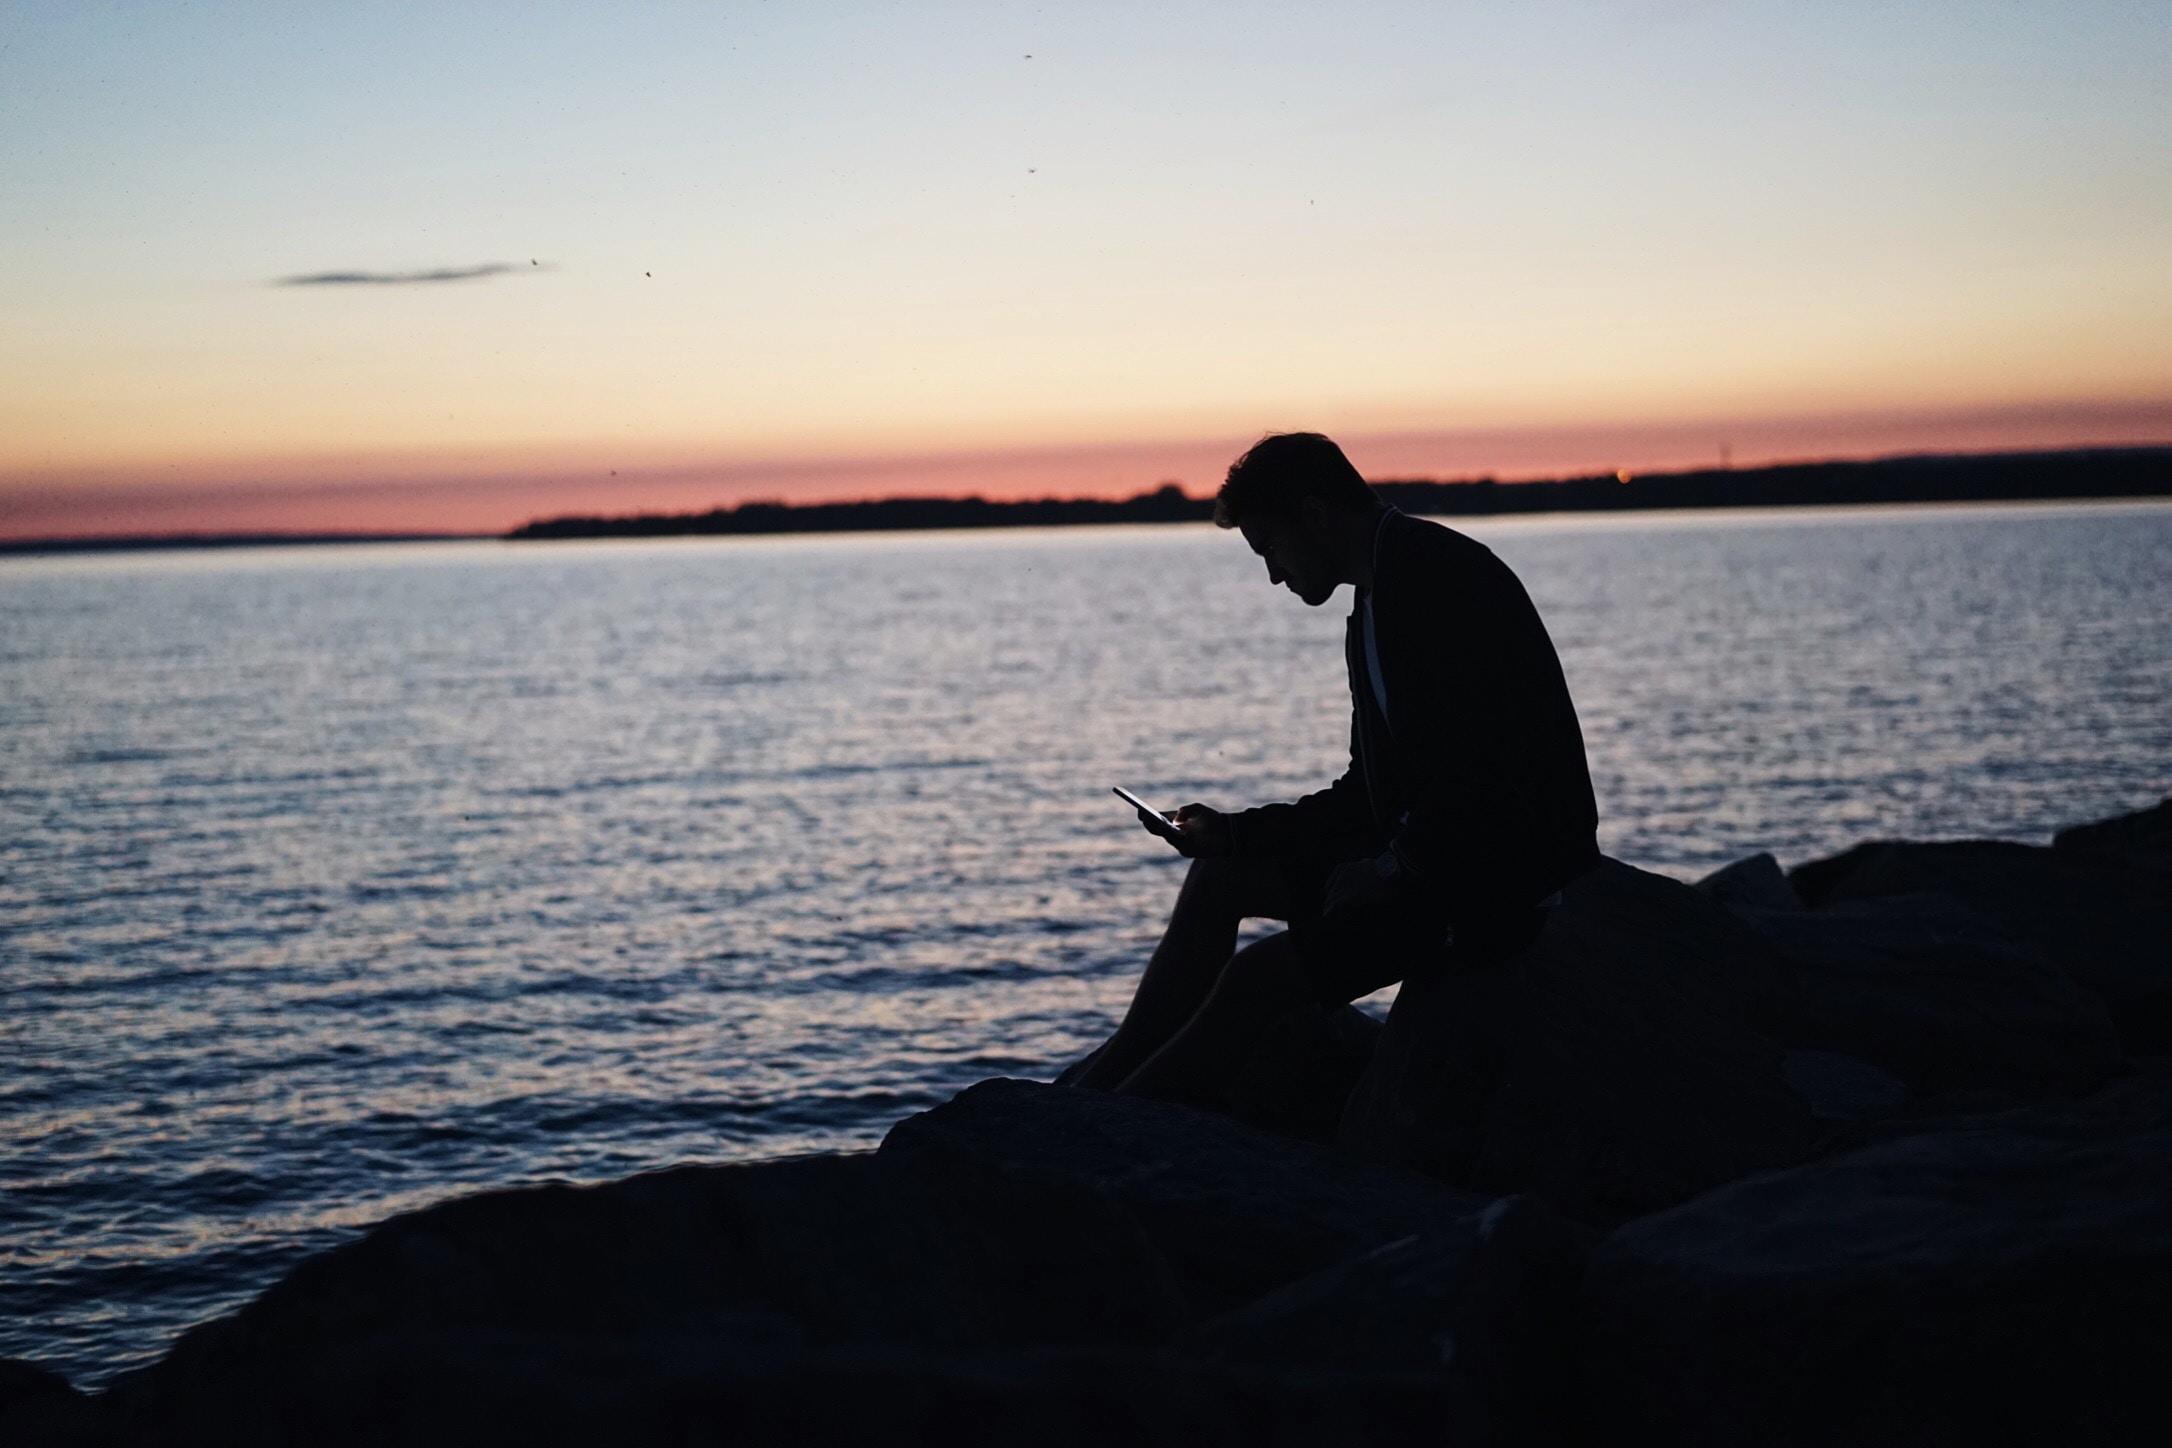 man sitting on rock in front of ocean